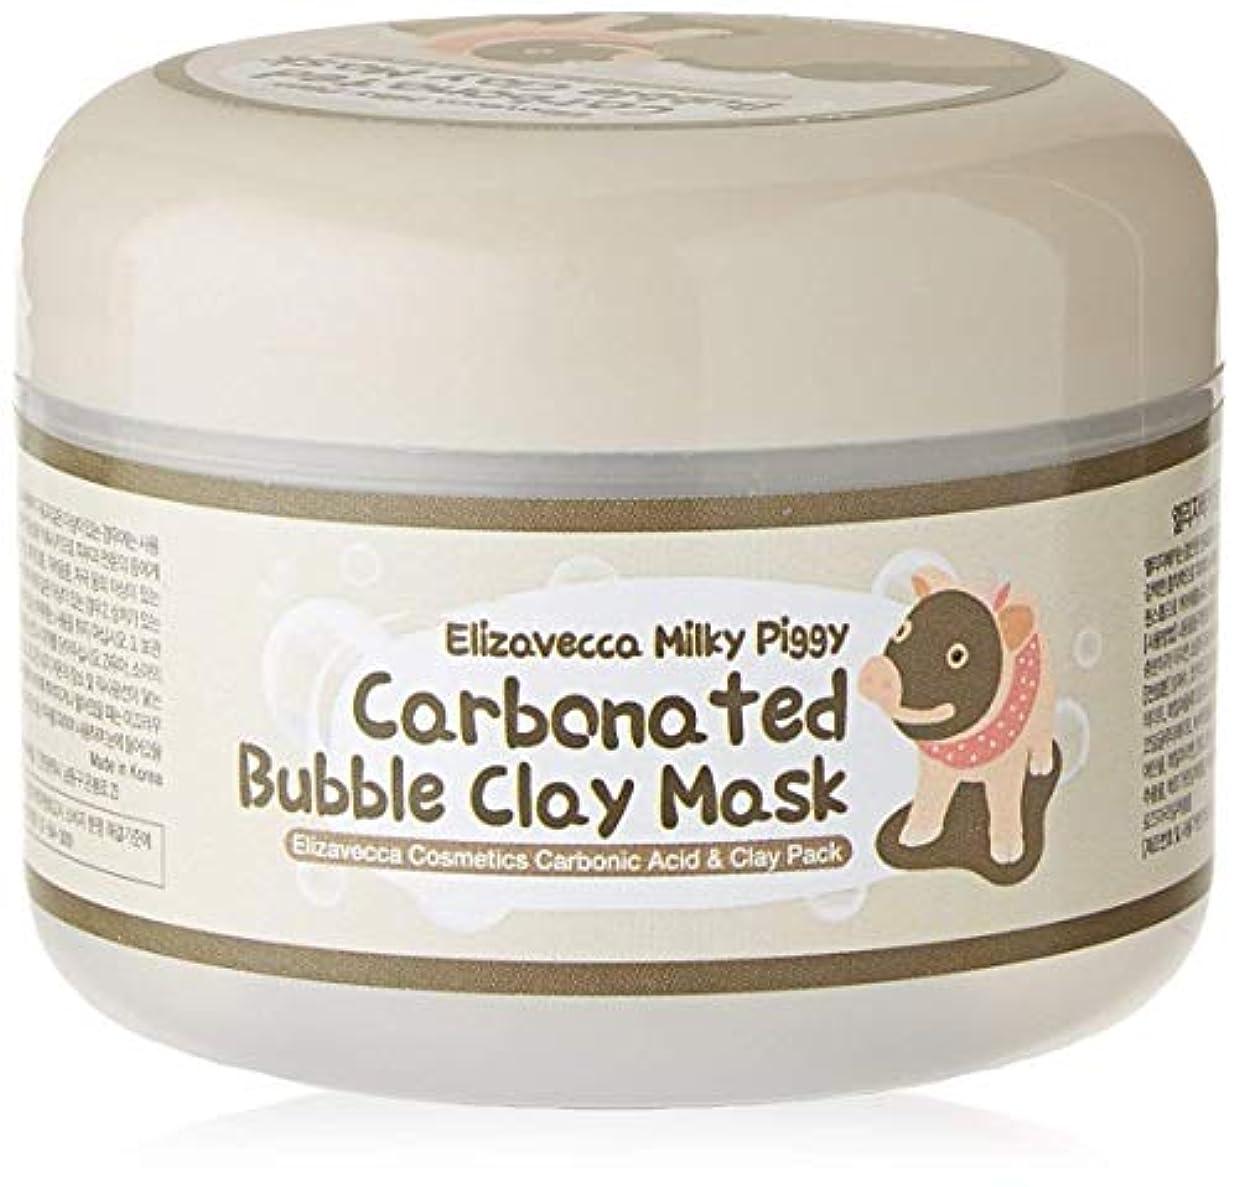 聴覚強打感謝祭Elizavecca Milky Piggy Carbonated Bubble Clay Mask 100g